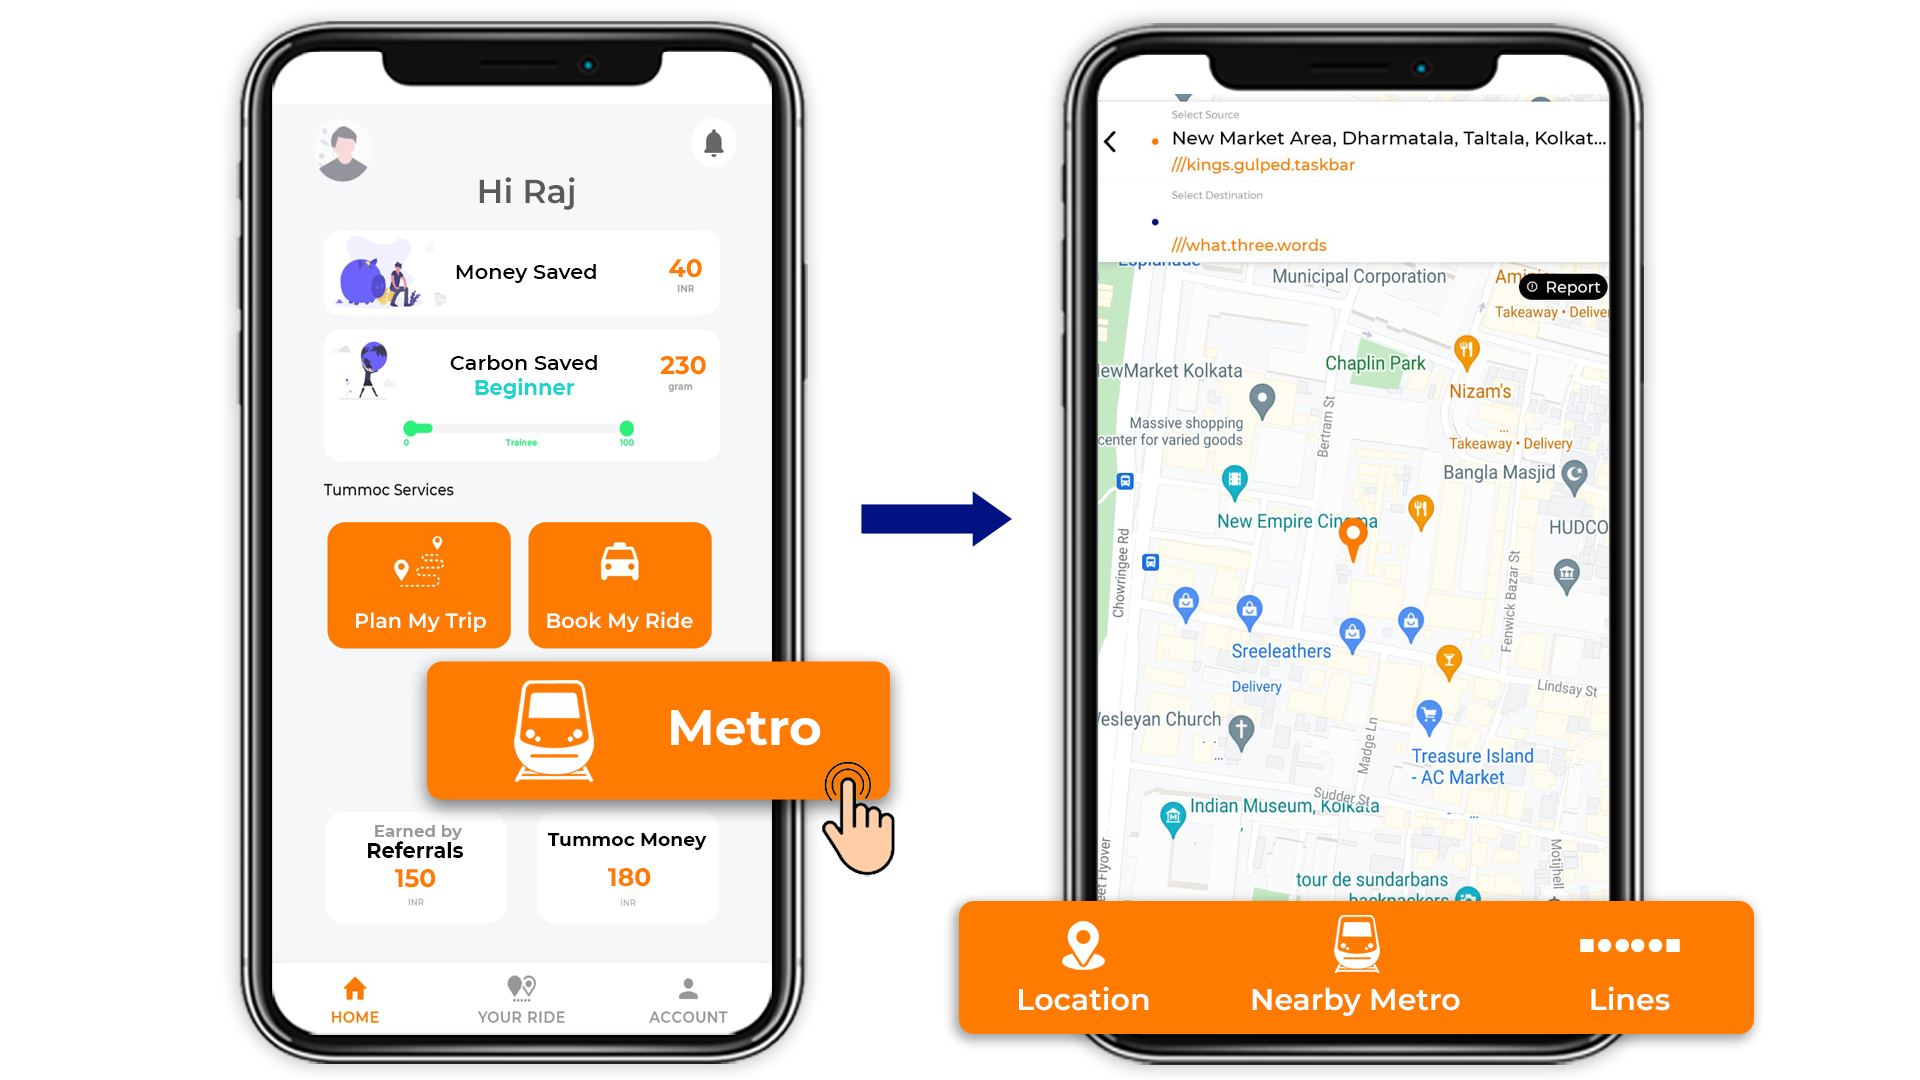 Tummoc, Tummoc App, Kolkata, Public Transport Information, Book Ride